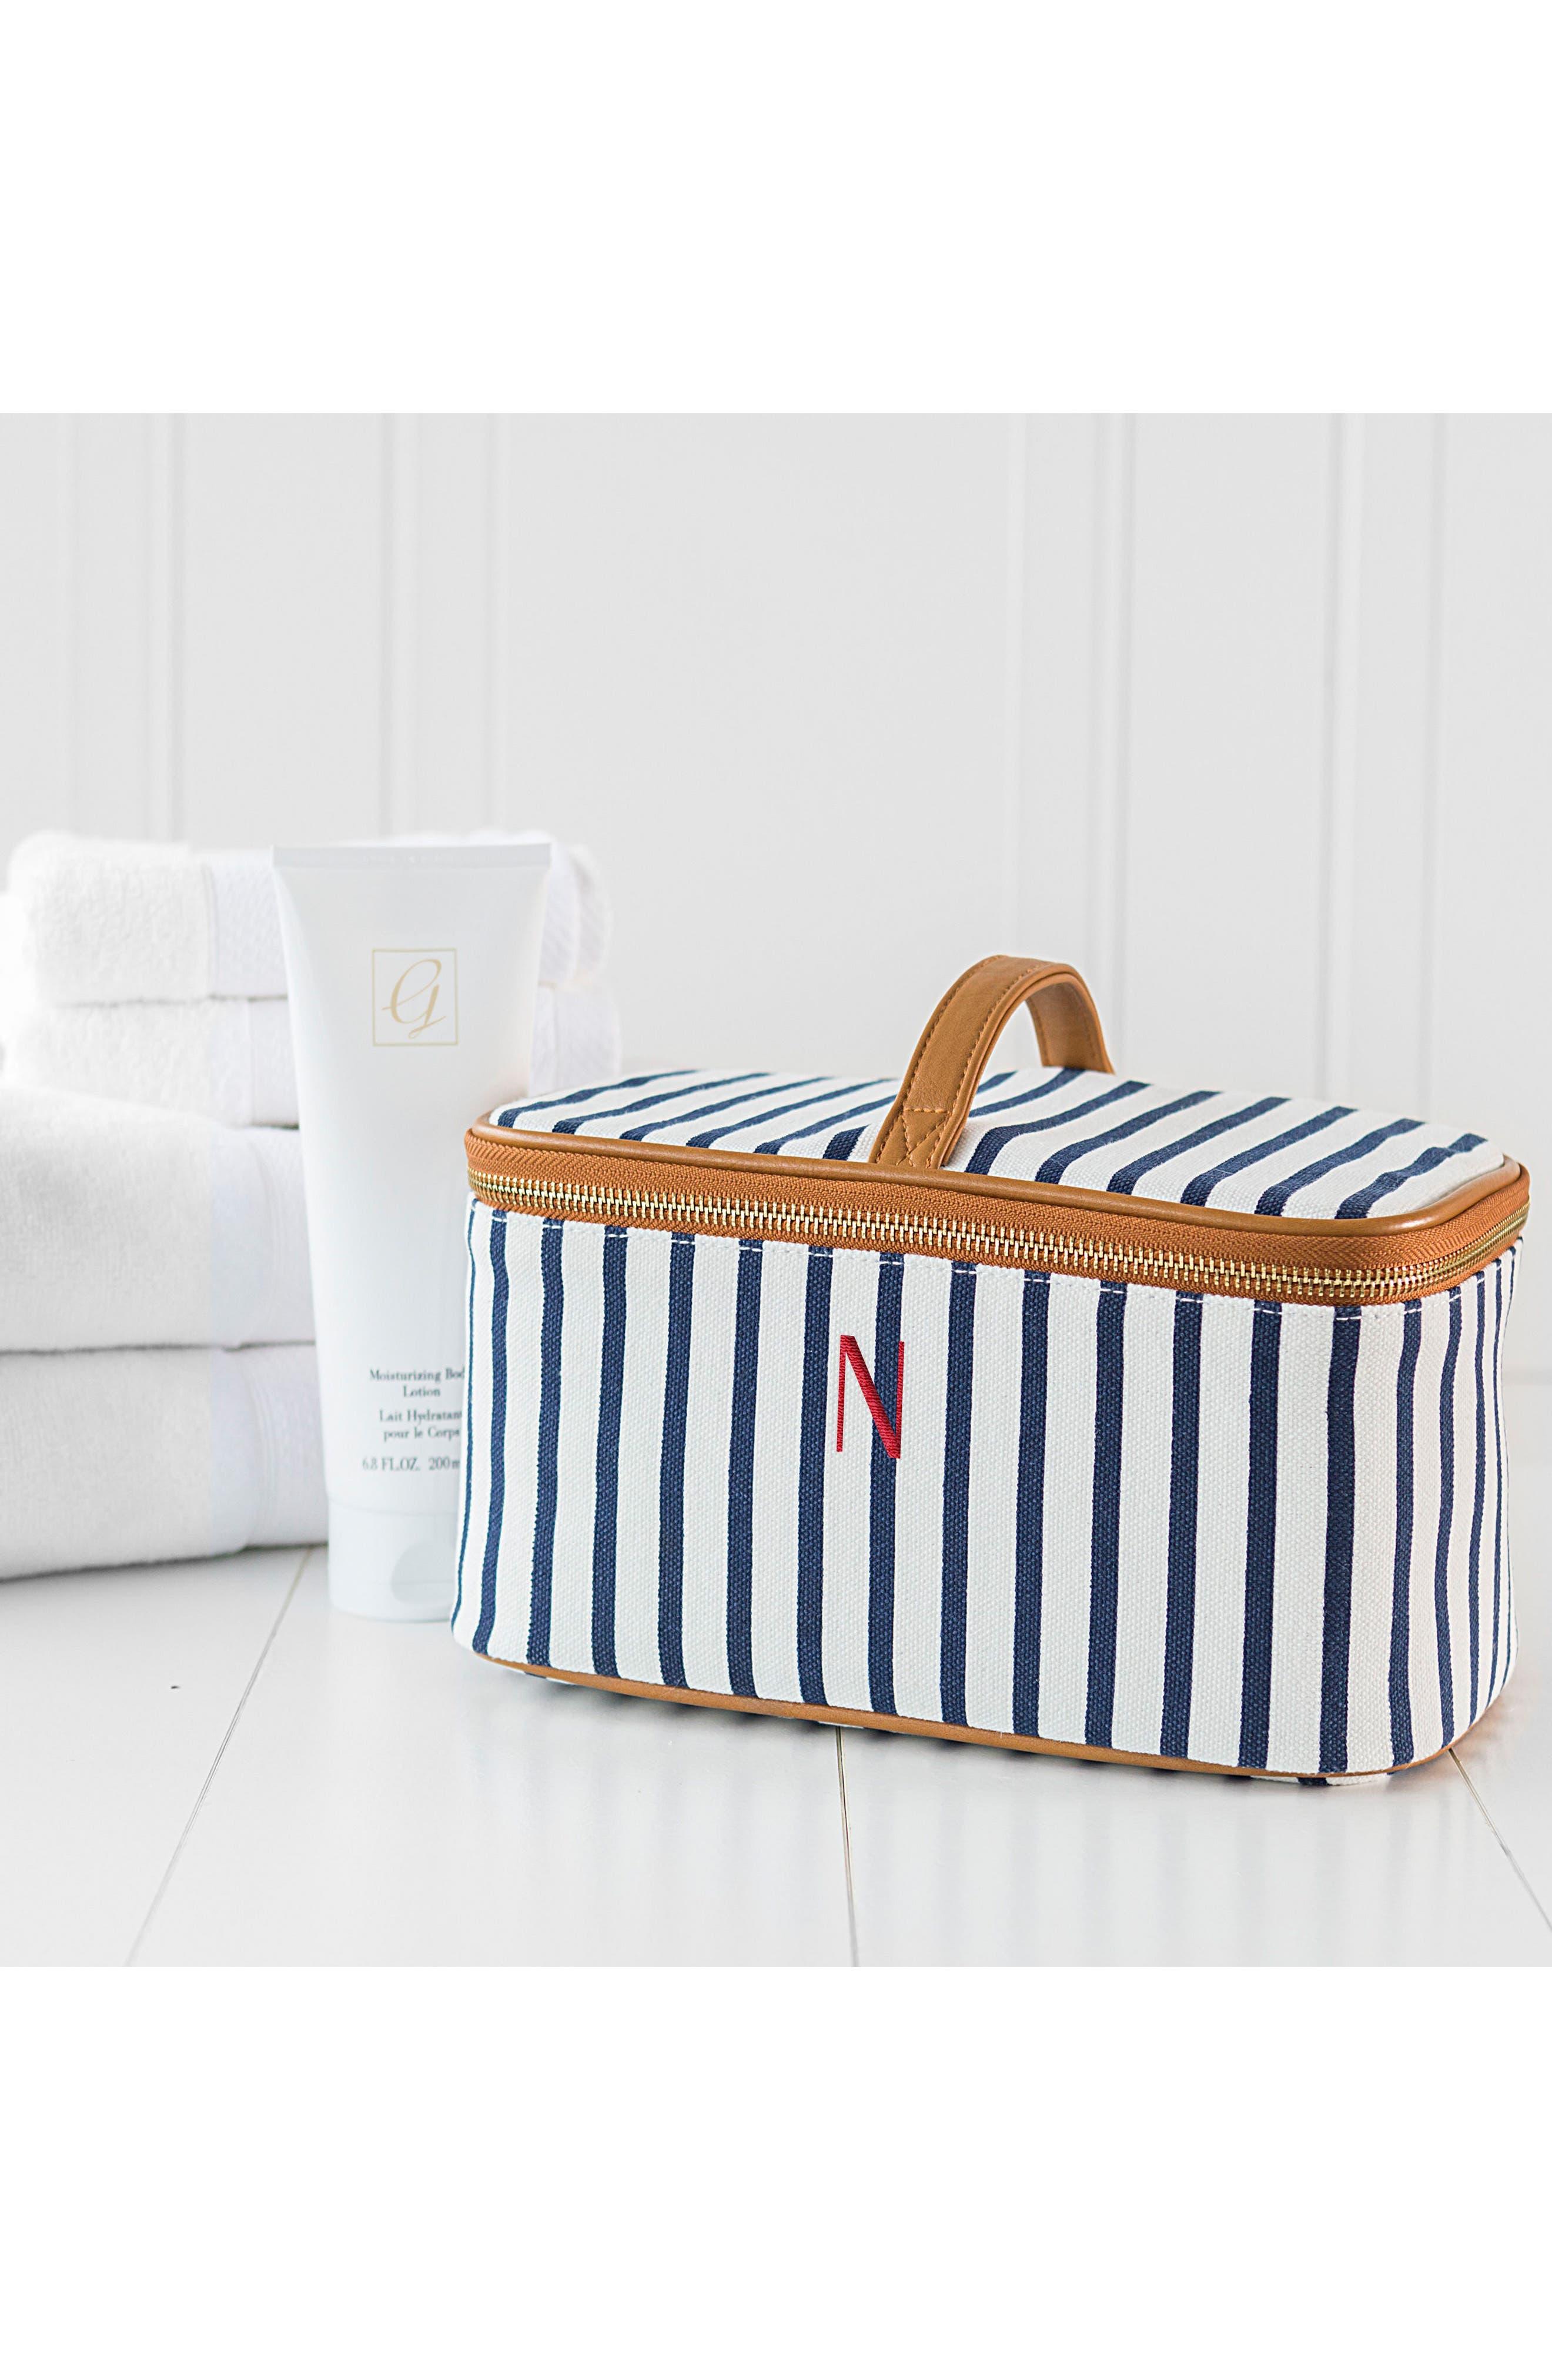 Monogram Stripe Canvas Cosmetics Case,                             Alternate thumbnail 9, color,                             BLUE